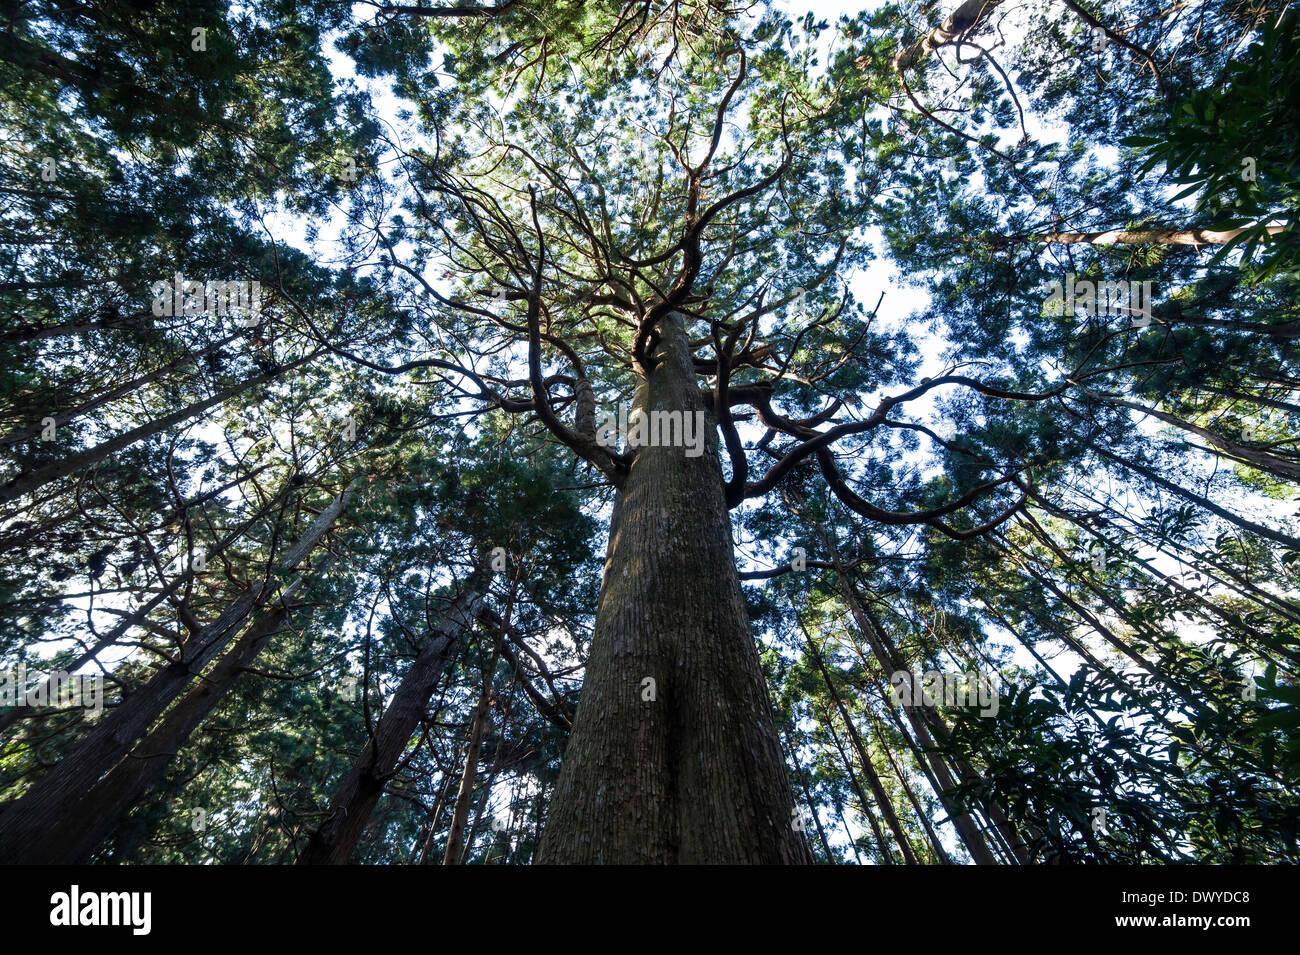 View of Looking up through a Giant Tree in Kumano Kodo, Higashimuro gun, Wakayama Prefecture, Japan - Stock Image